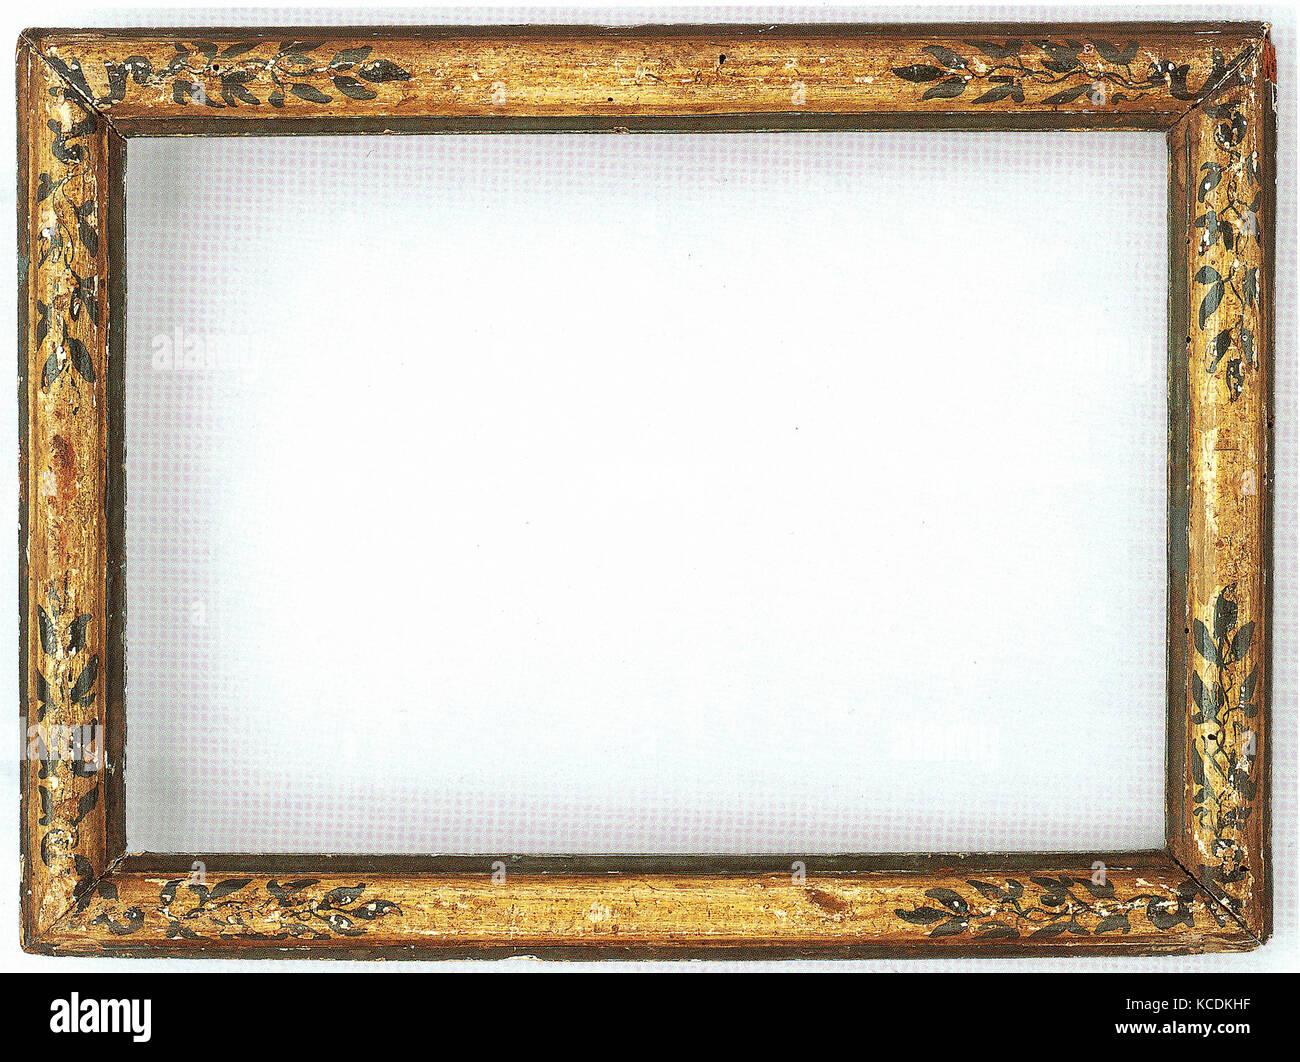 Astragal Marco espejo, siglo XVIII, italiano, de Génova, de los ...